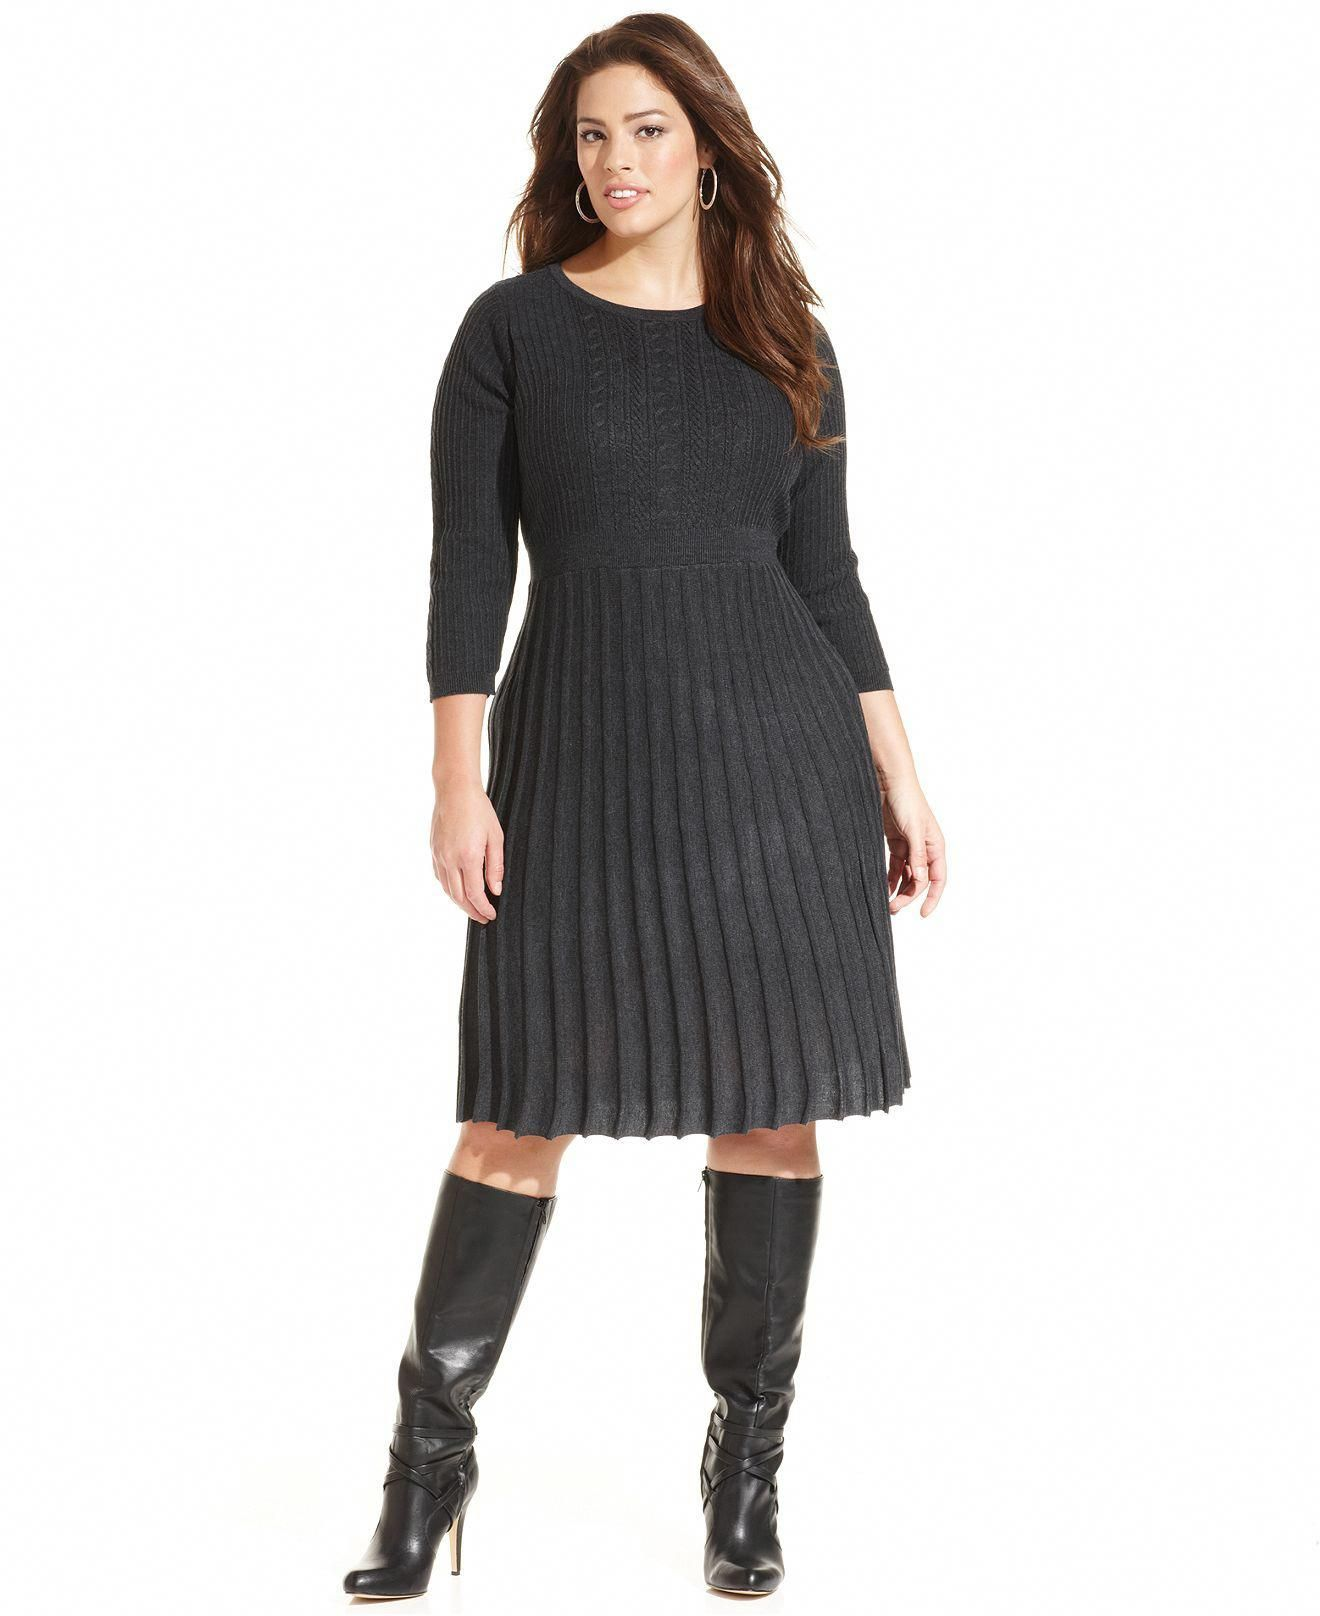 Women S Plus Size Dresses At Belk ...